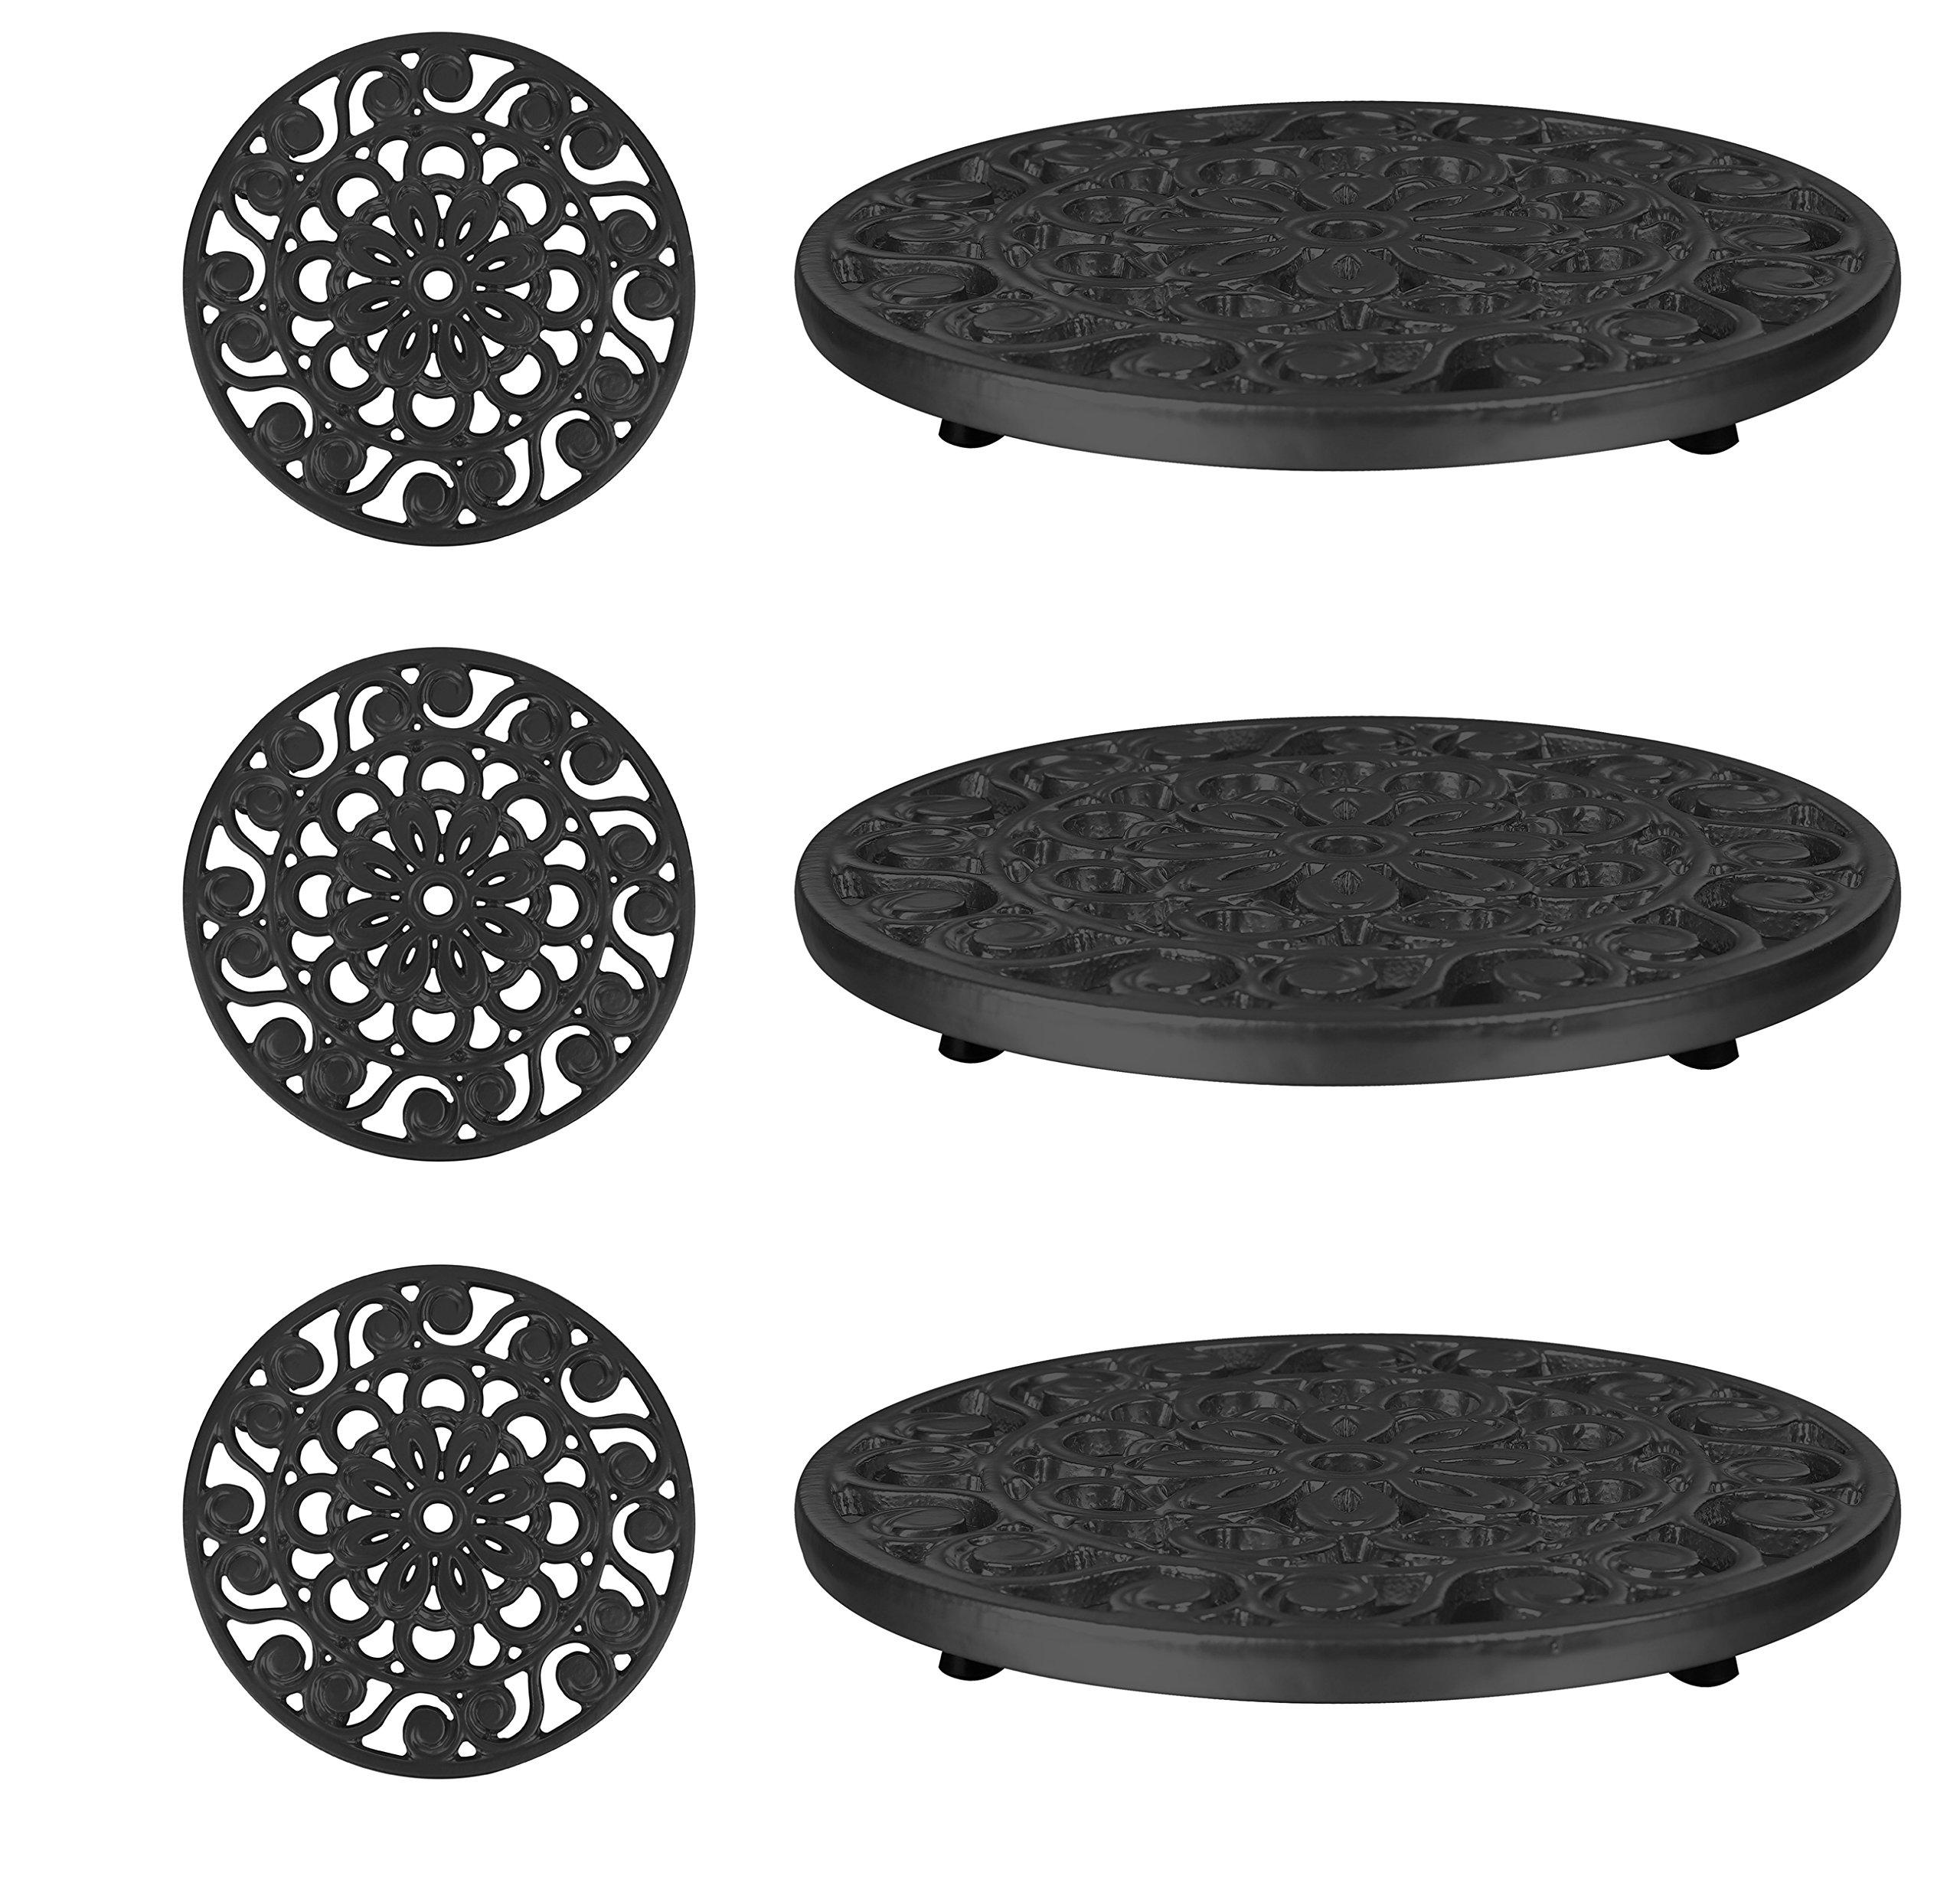 Trademark Innovations Set of 3 Decorative Cast Iron Metal Trivets (Black)